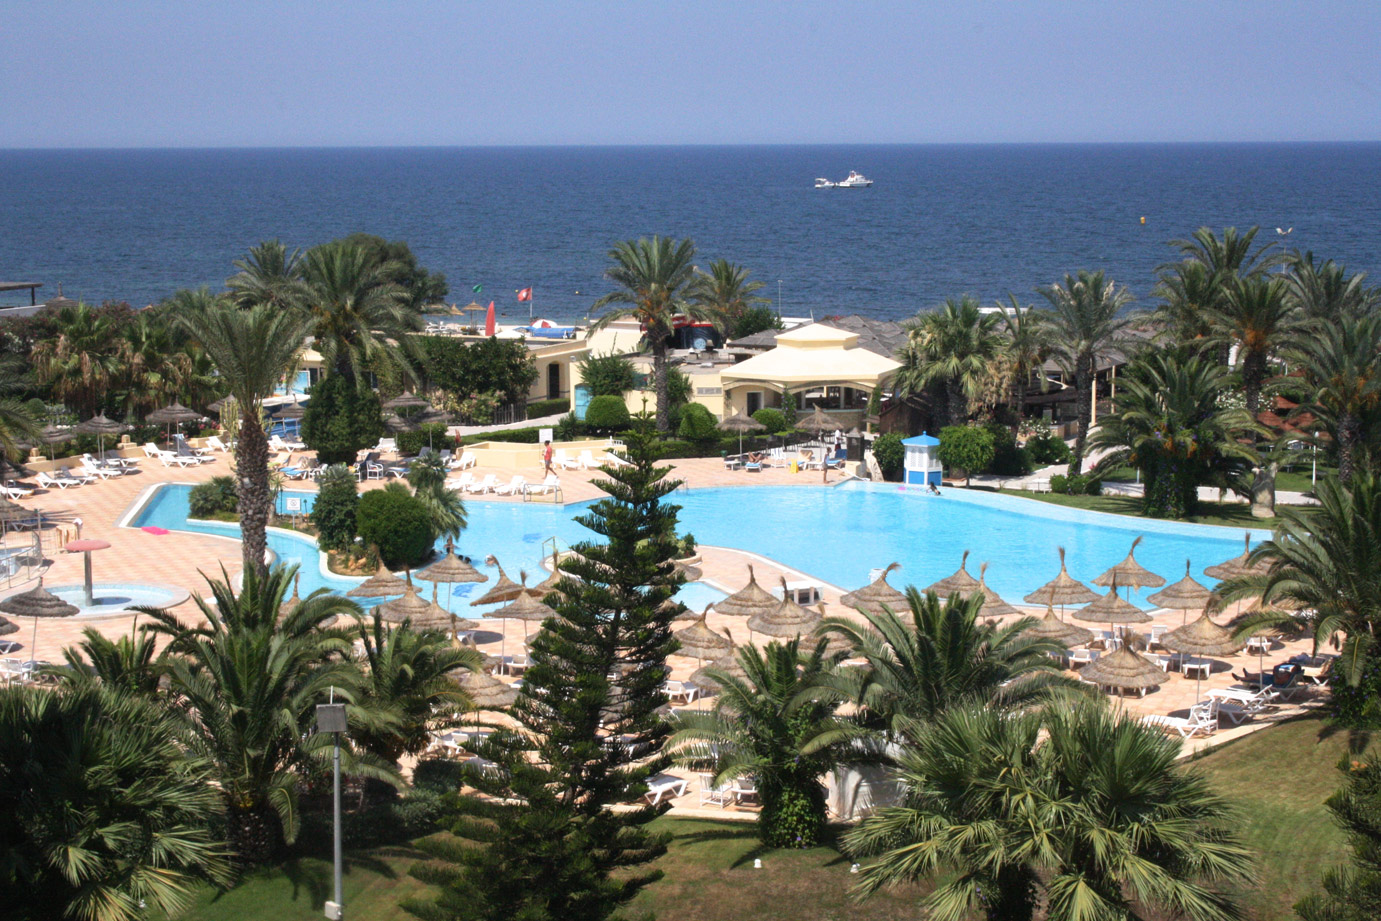 TUNISIA: PHOTO DIARY II. 14